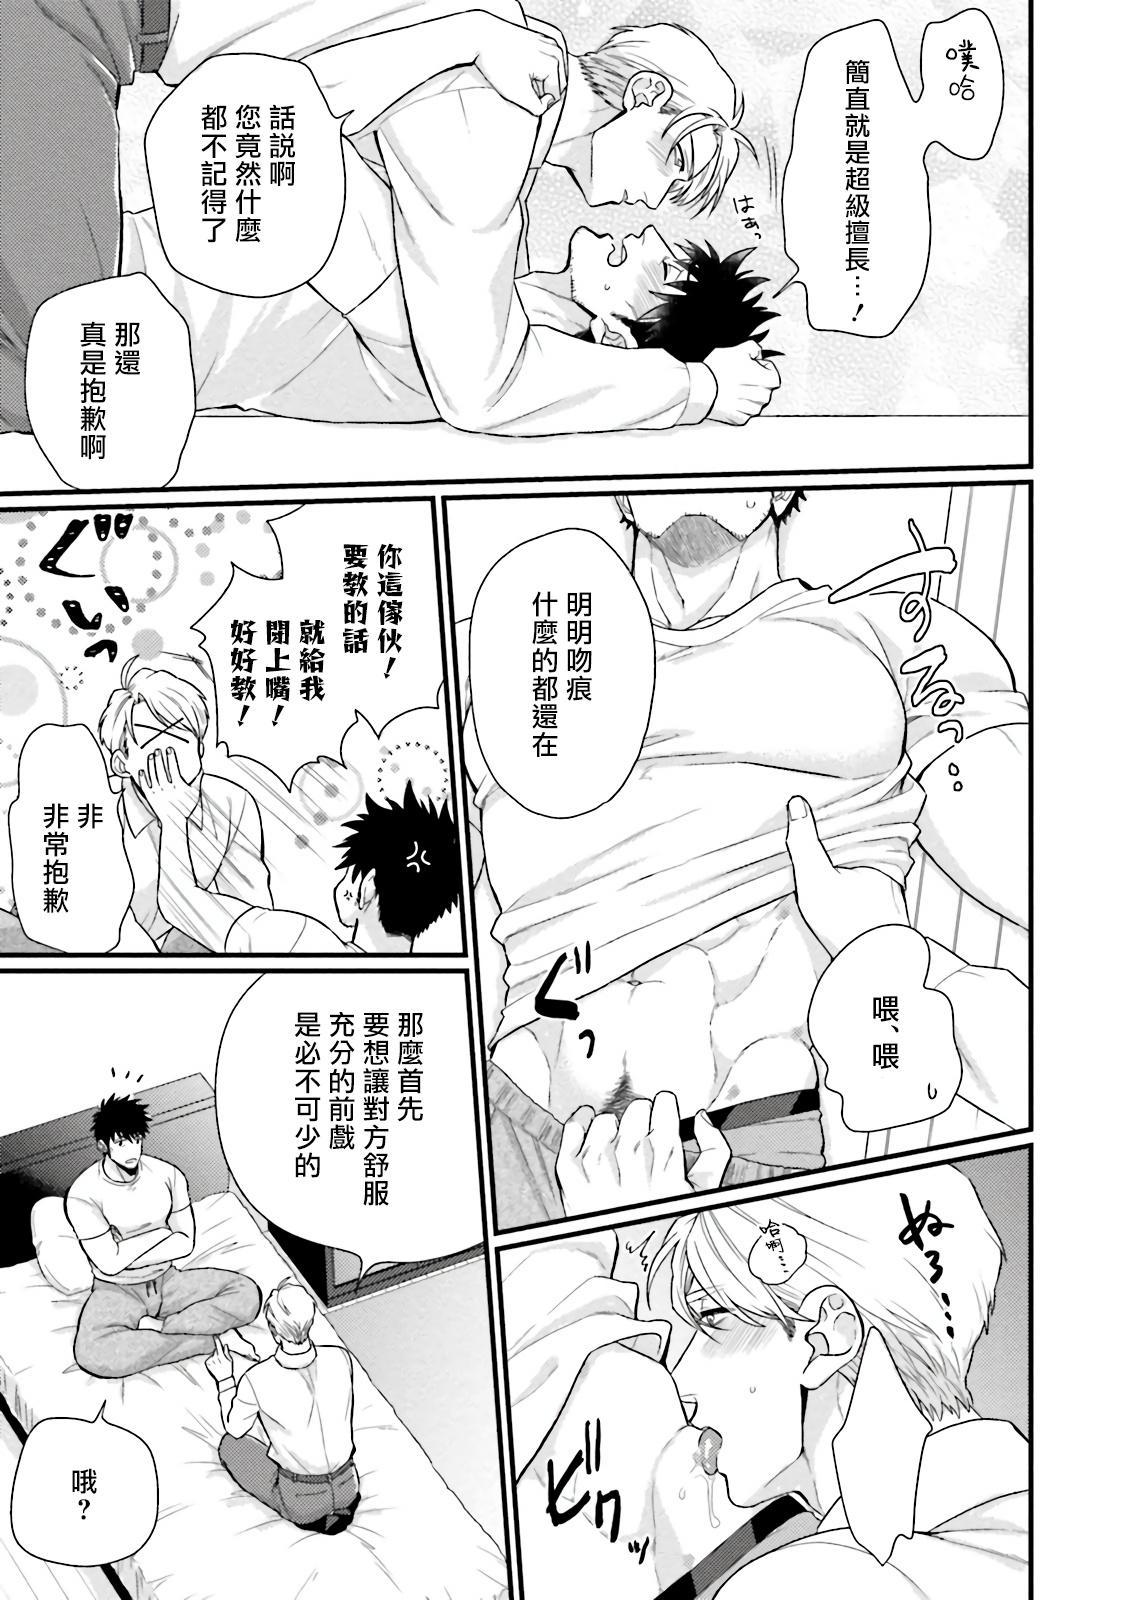 Kinou wa Otanoshimi Deshita ne | 昨天过得很愉快吧 Ch. 1-4+特典 116